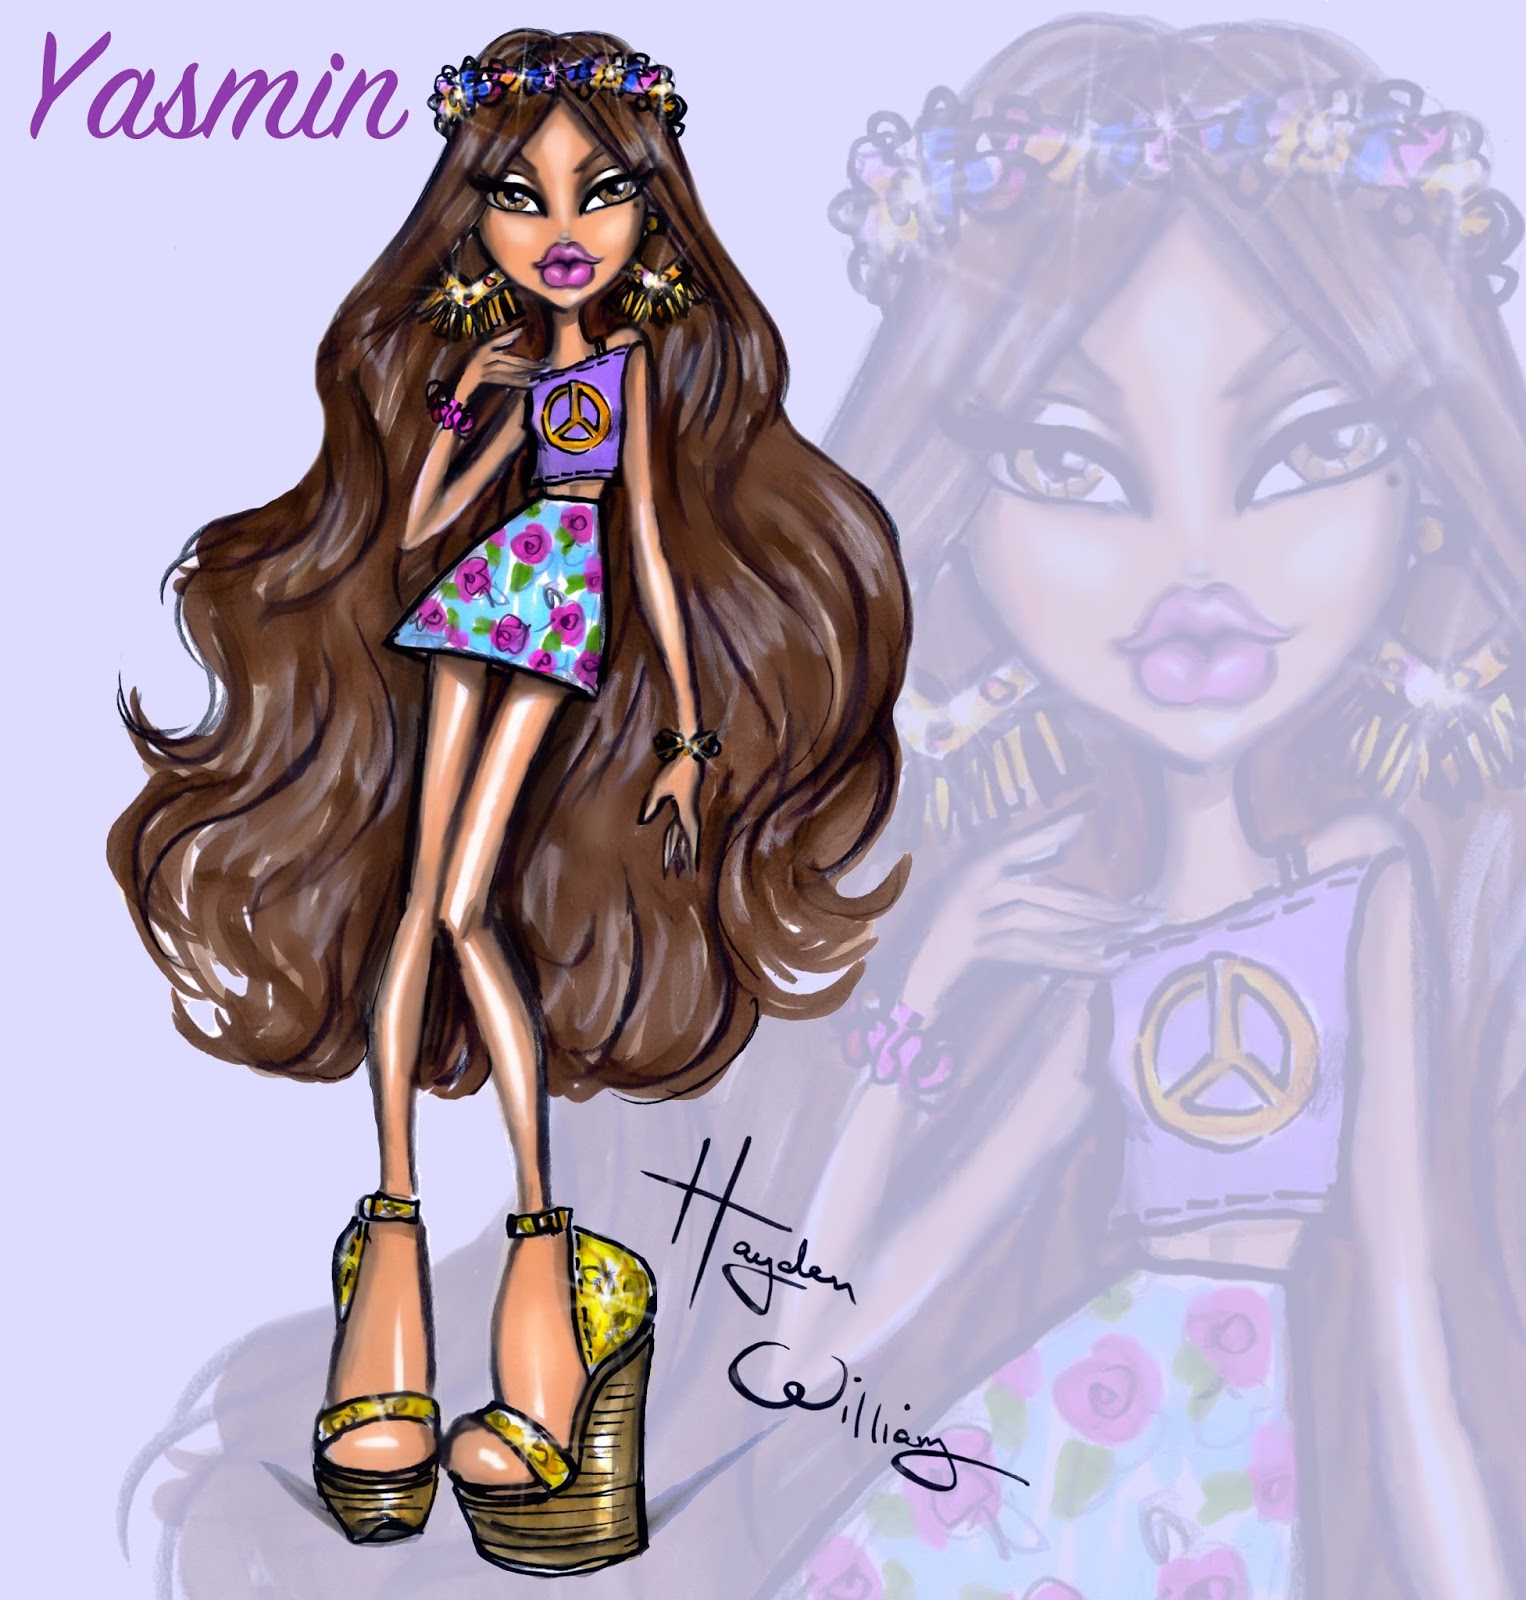 hayden williams fashion illustrations july 2015